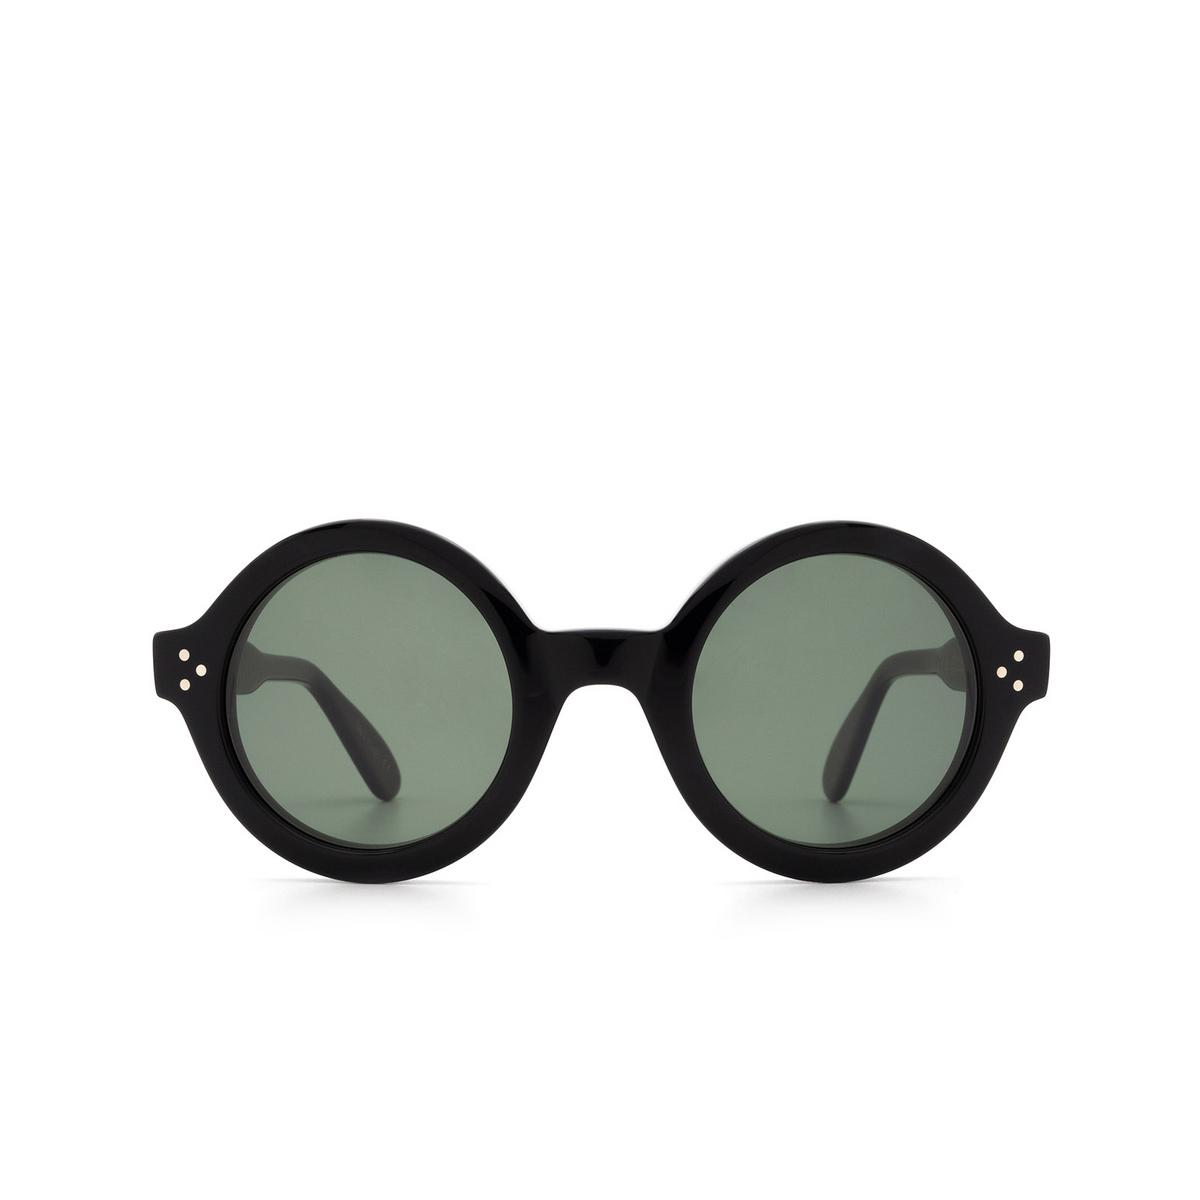 Lesca® Round Sunglasses: Phil Sun color Black 5 - front view.